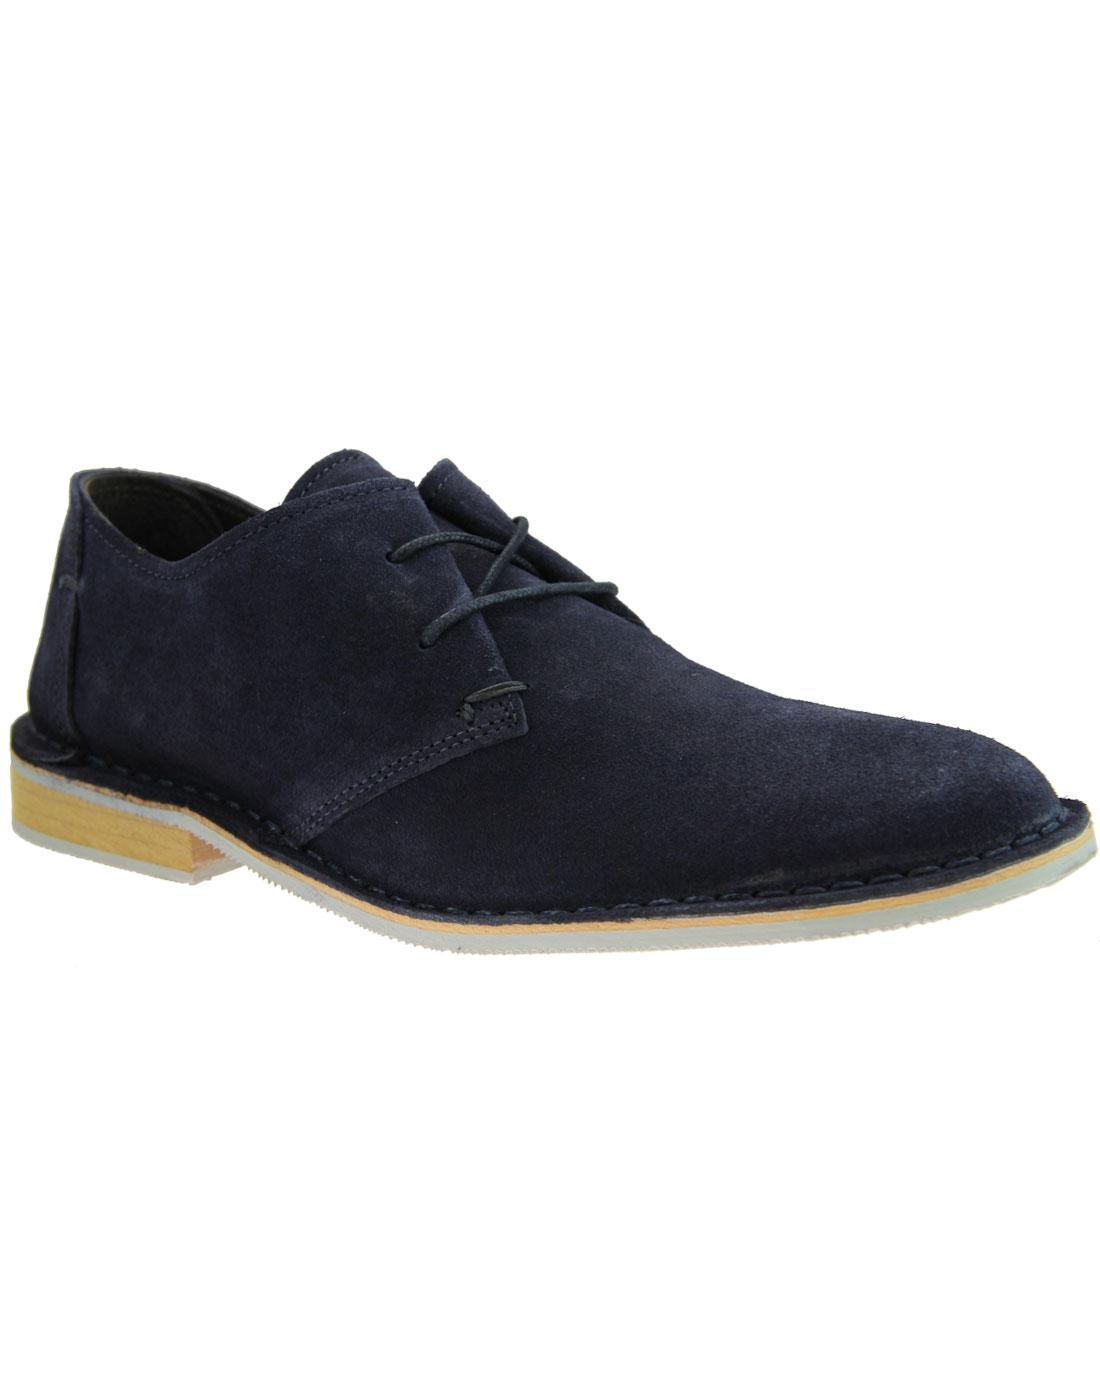 Franklin IKON Retro Mod Suede Desert Shoes NAVY